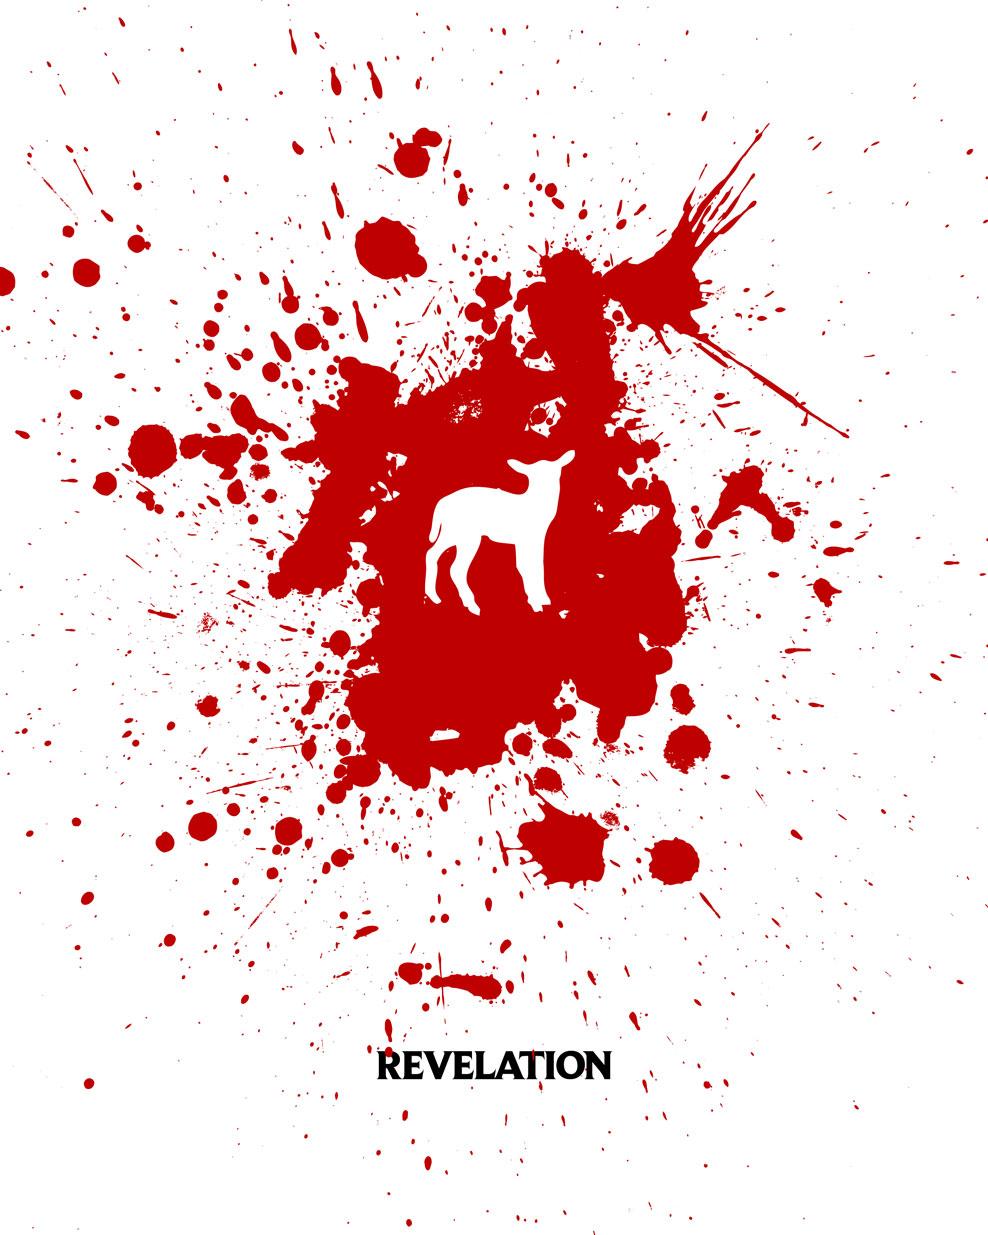 66-Revelation_Jim-LePage.jpg